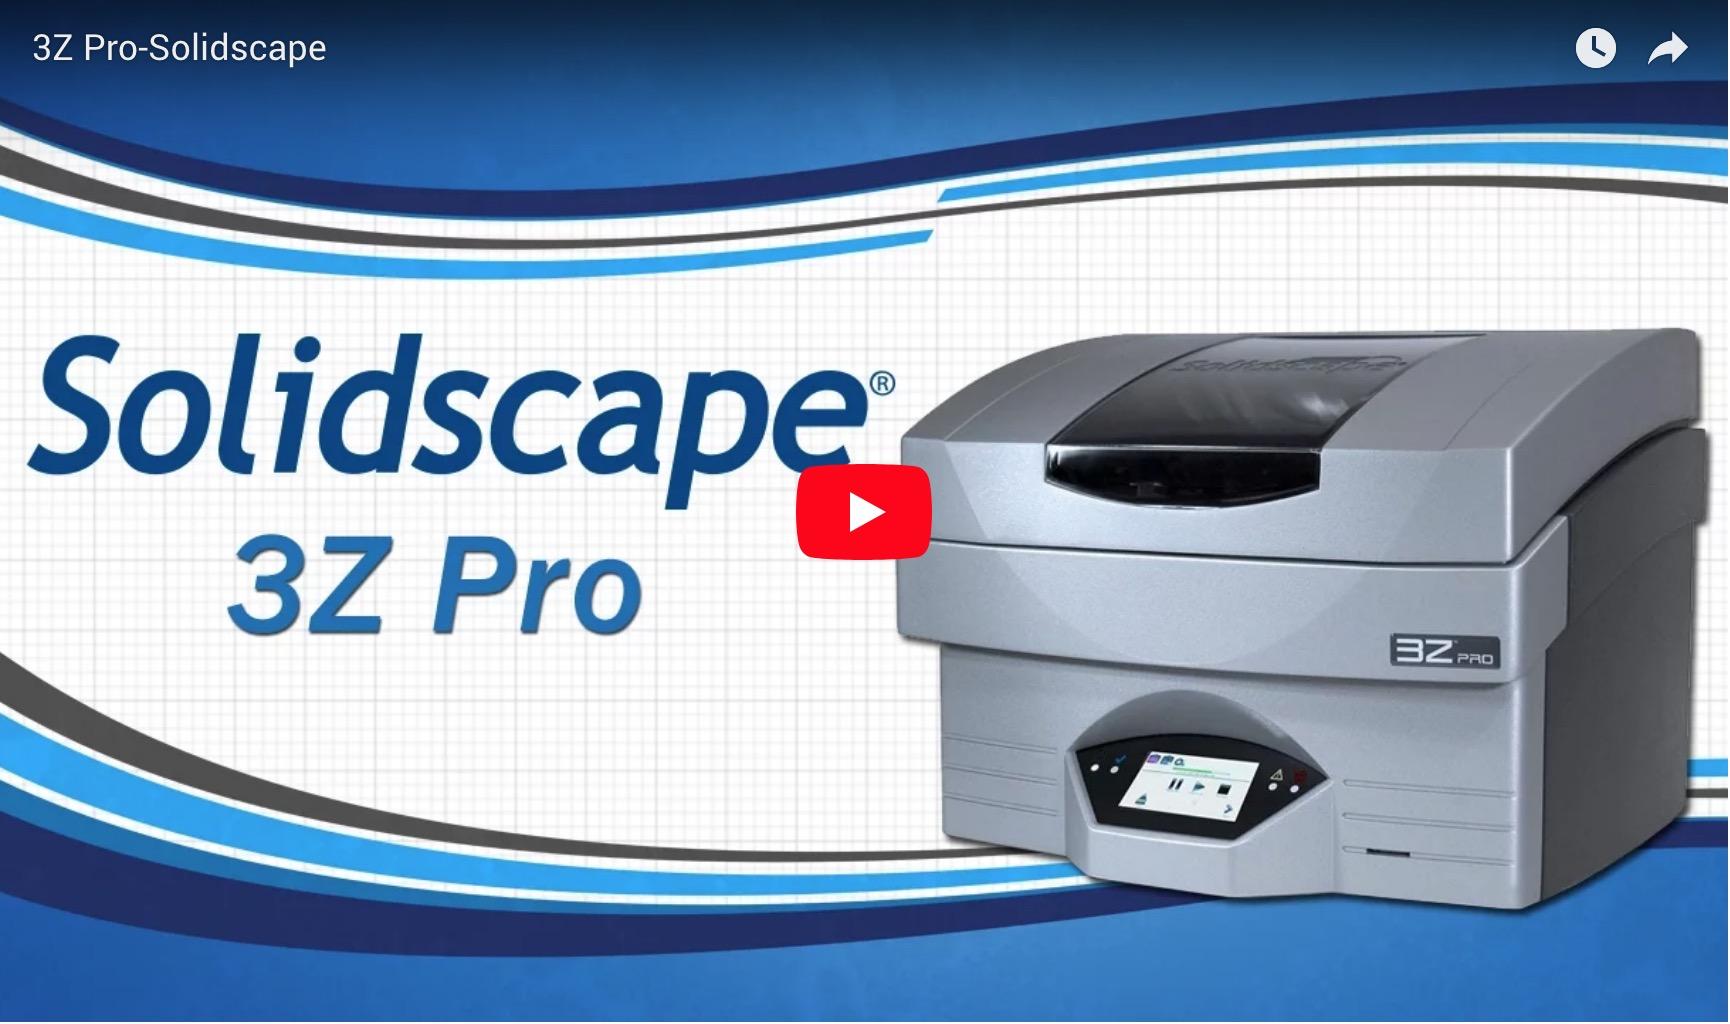 3Z Pro - Solidscape